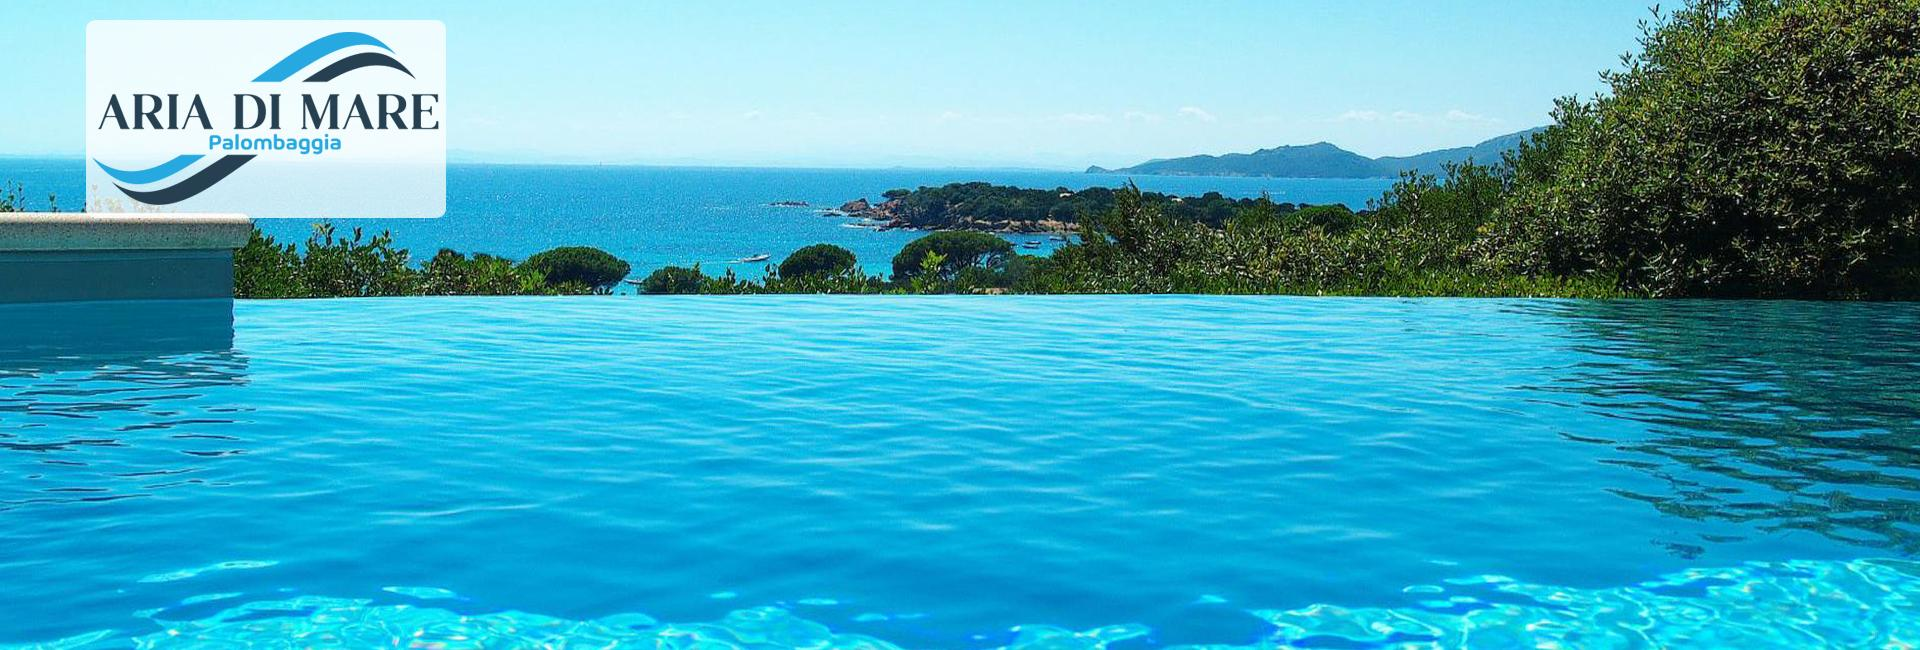 Villa bord de mer Palombaggia